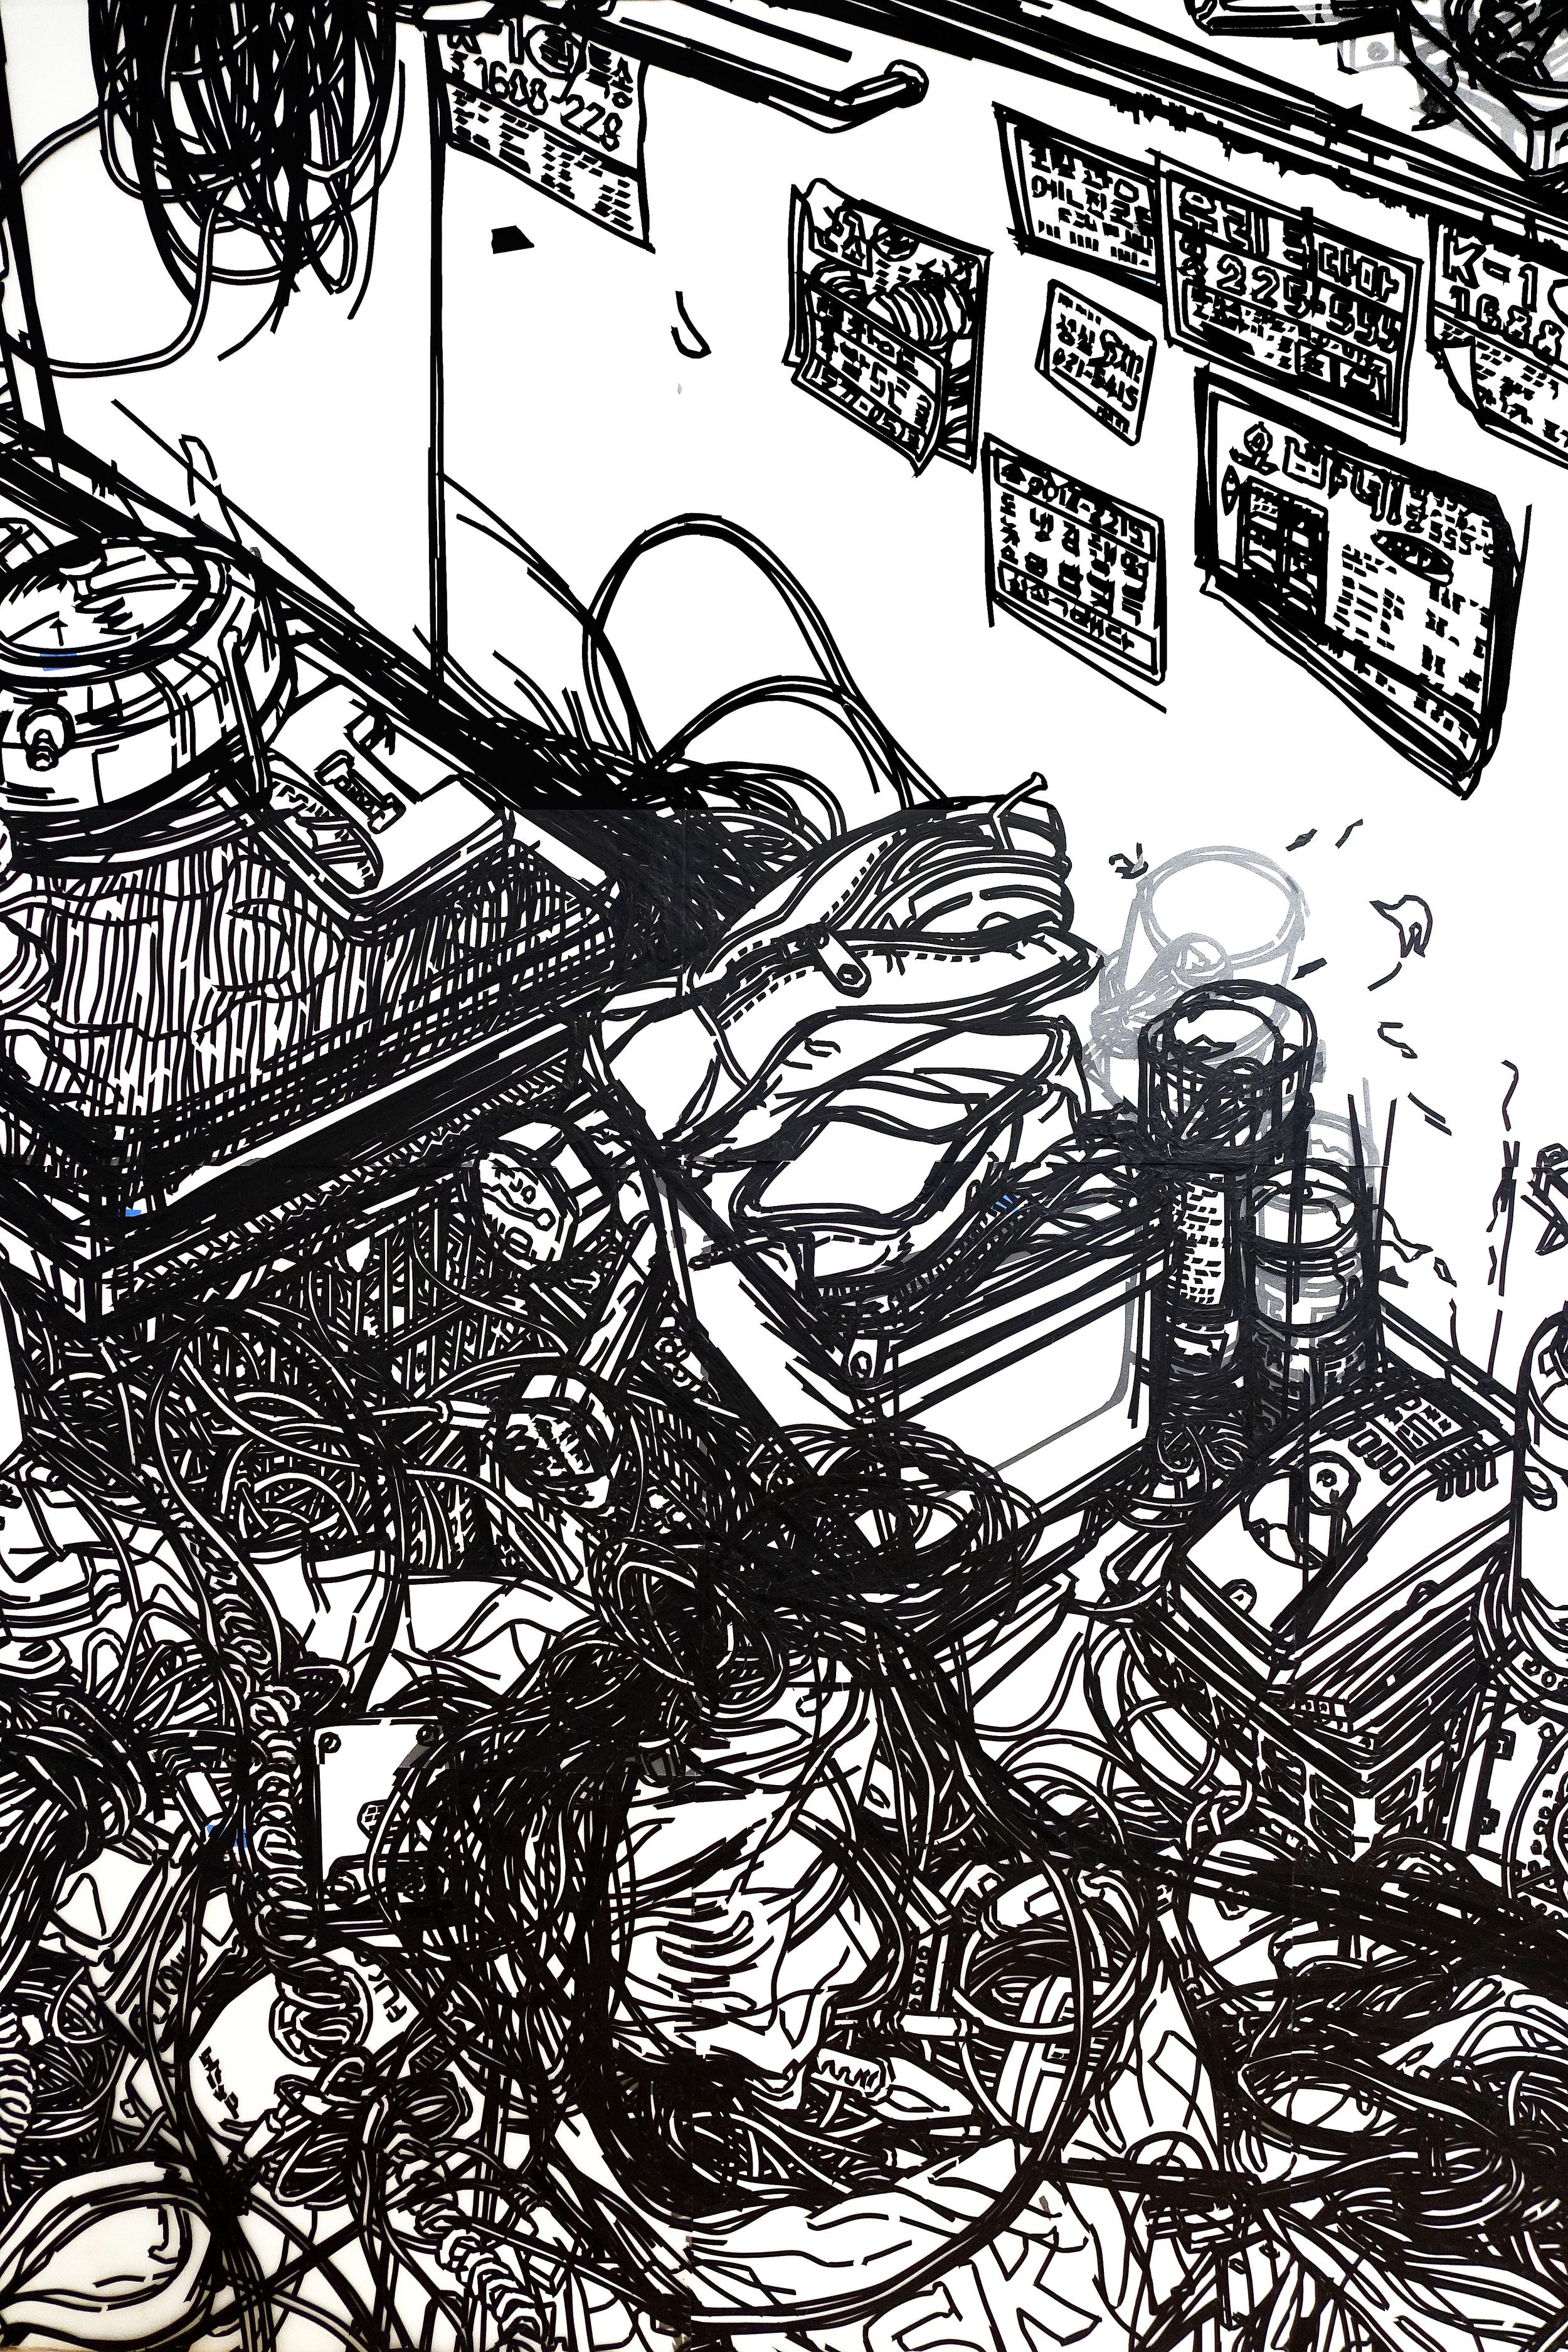 Heeseop Yoon   Still Life #31 ,2015  Detail View, Dedee Shattuck Gallery, MA  Black Masking tape on Mylar  8' x 26